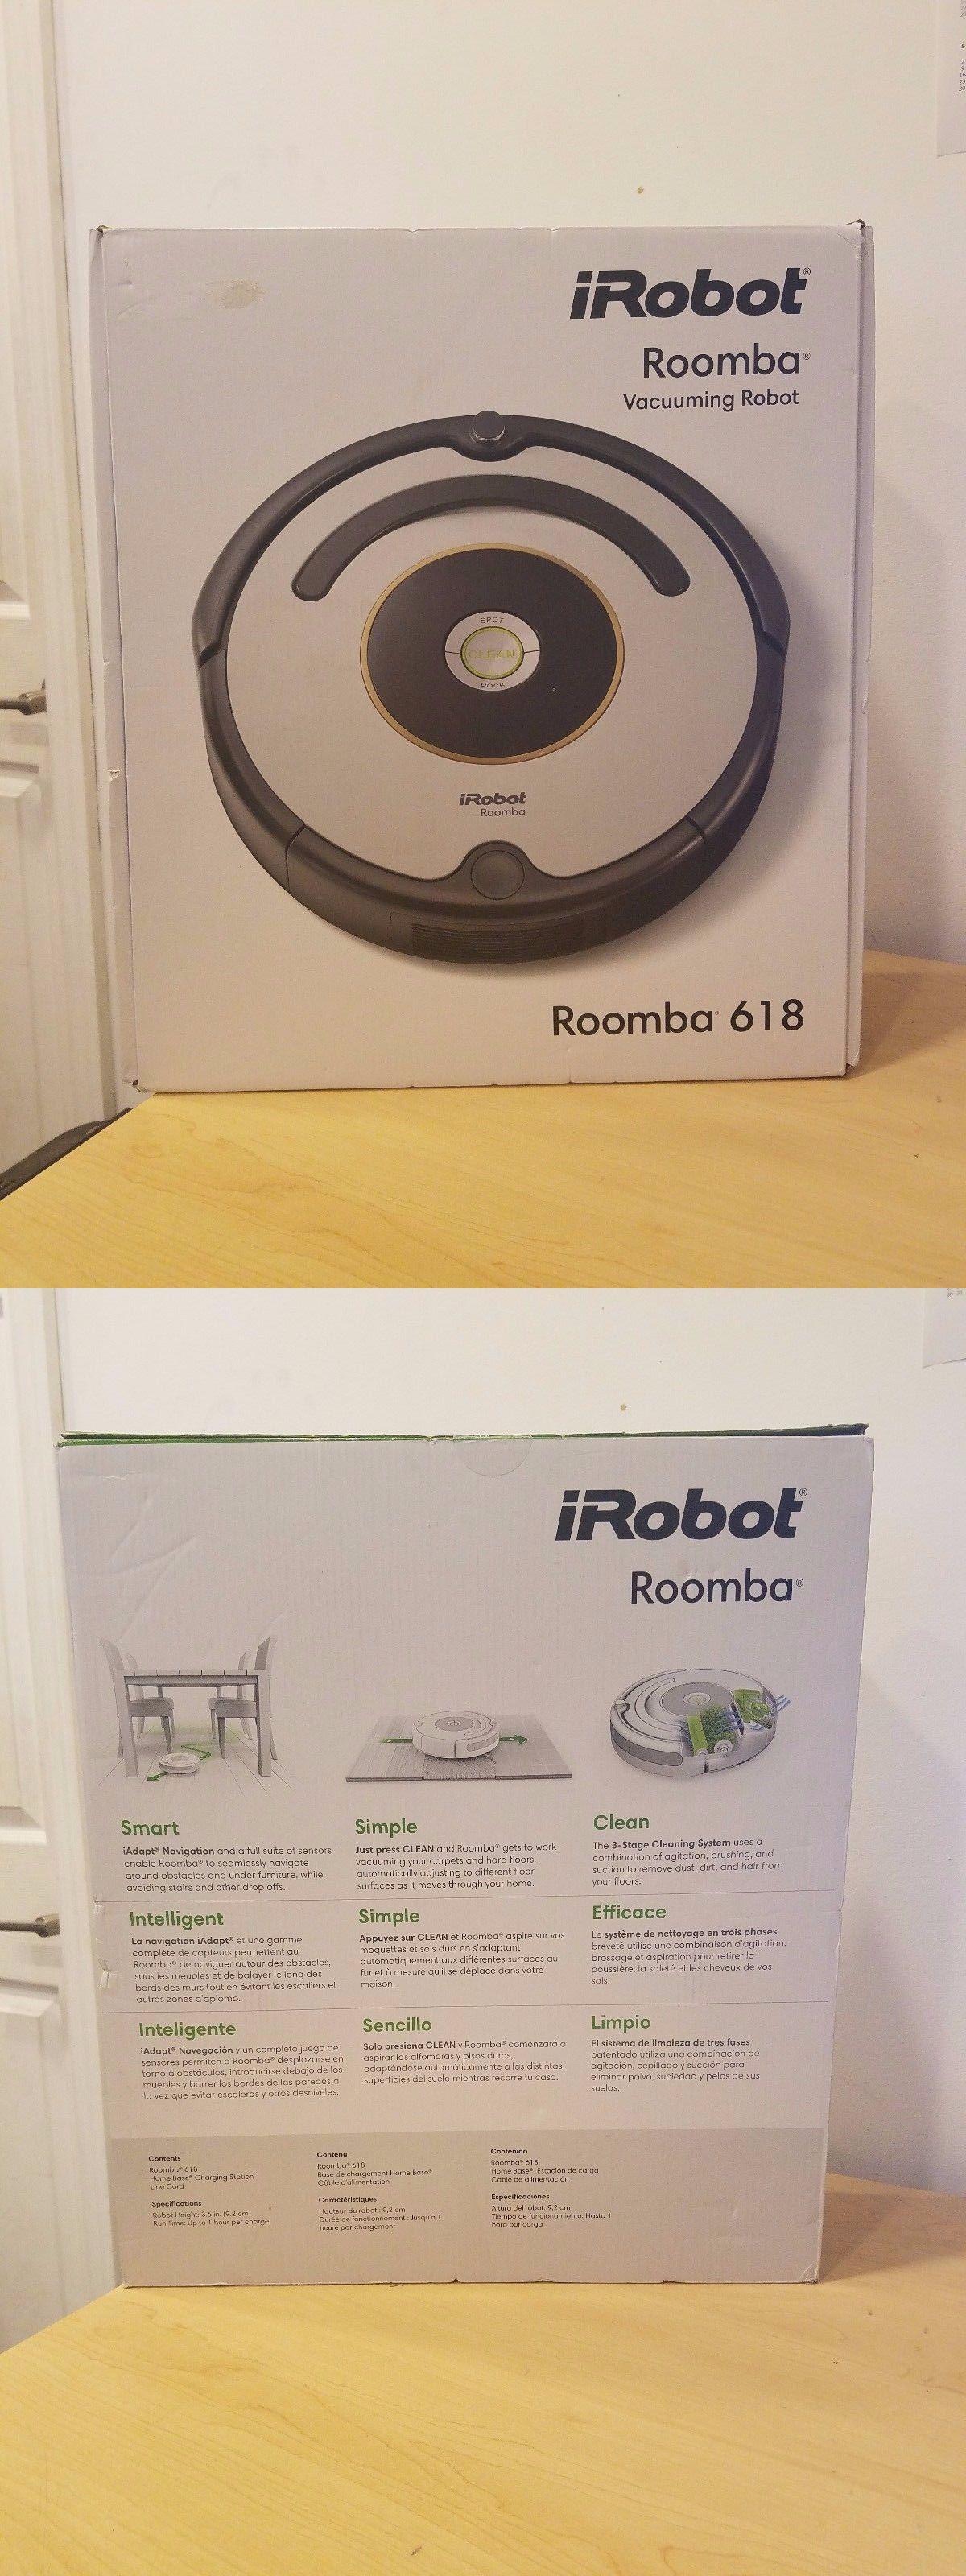 Brand iRobot Roomba 618 Automatic Vacuum Cleaner Robot